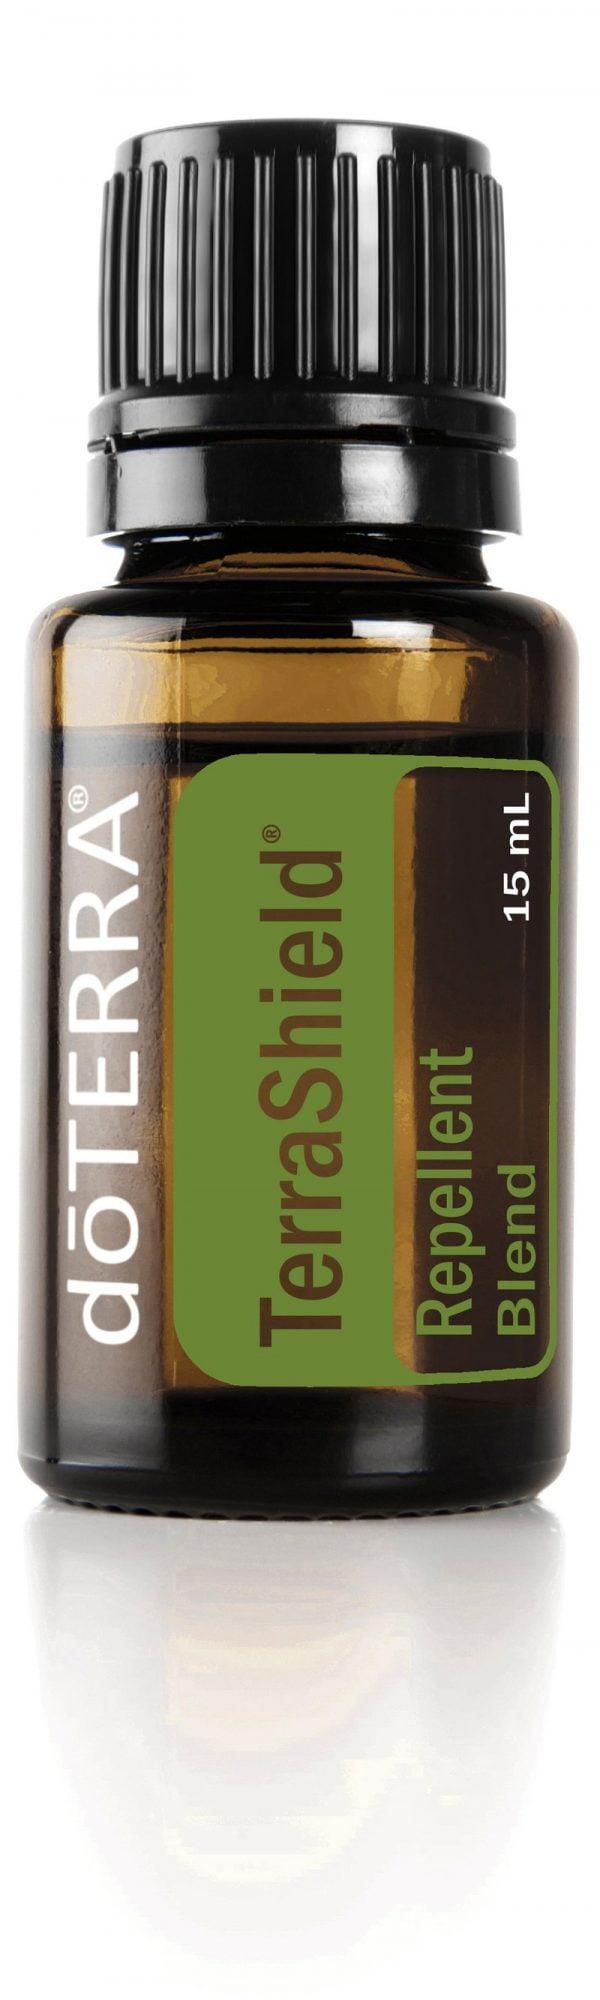 dōTERRA TerraShield® Outdoor Blend - 15ml